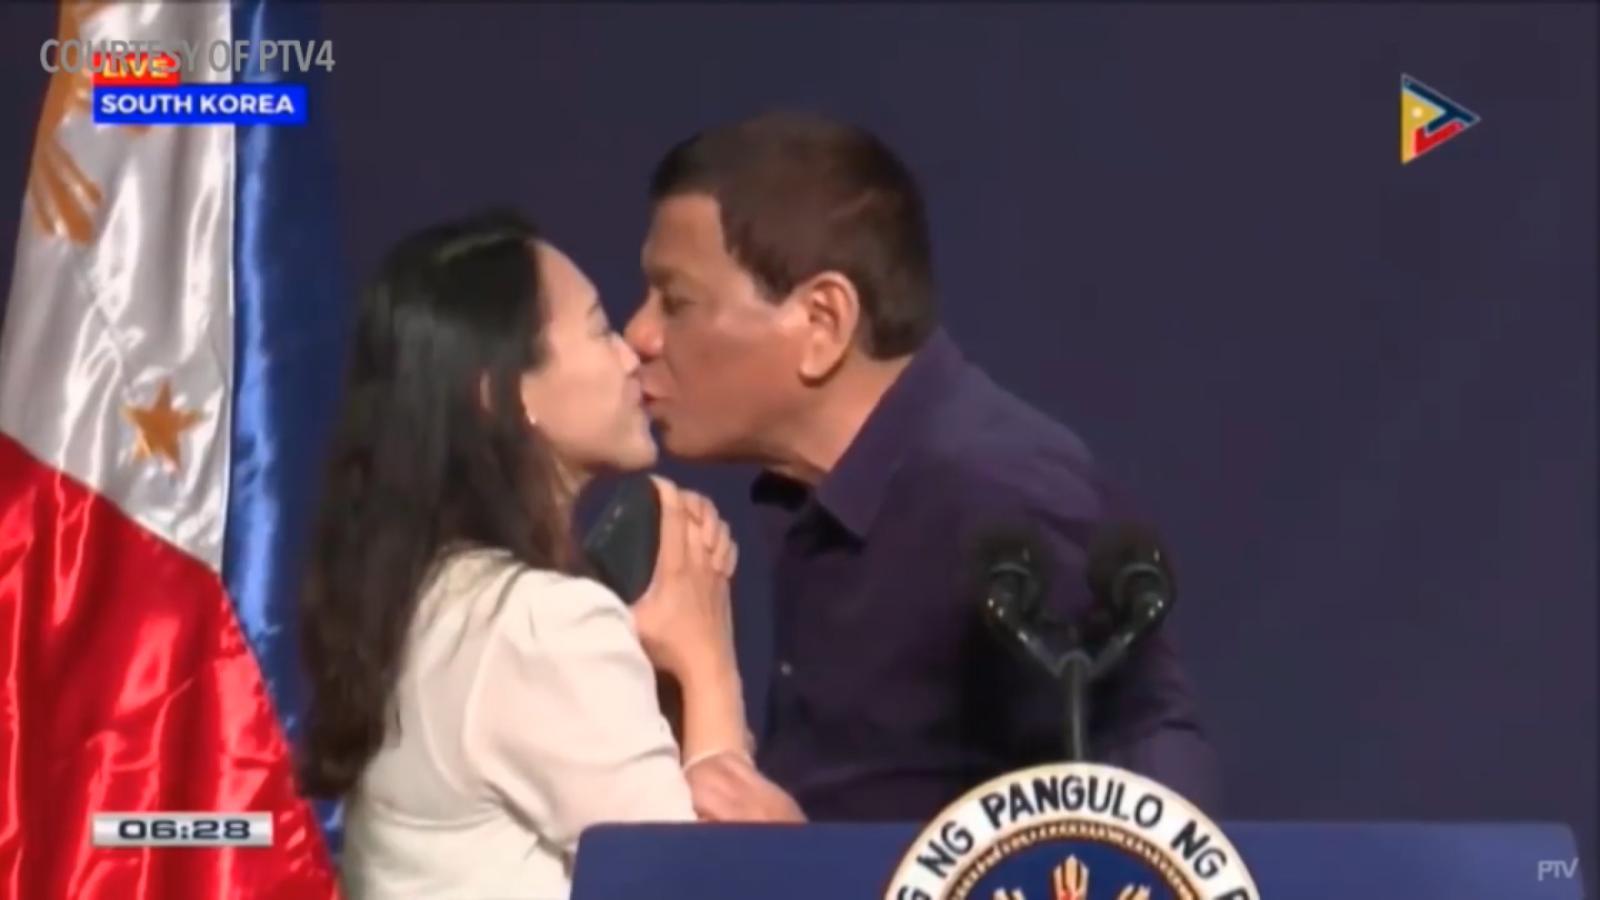 Dutertes kiss was act of endearment spokesman says cnn m4hsunfo